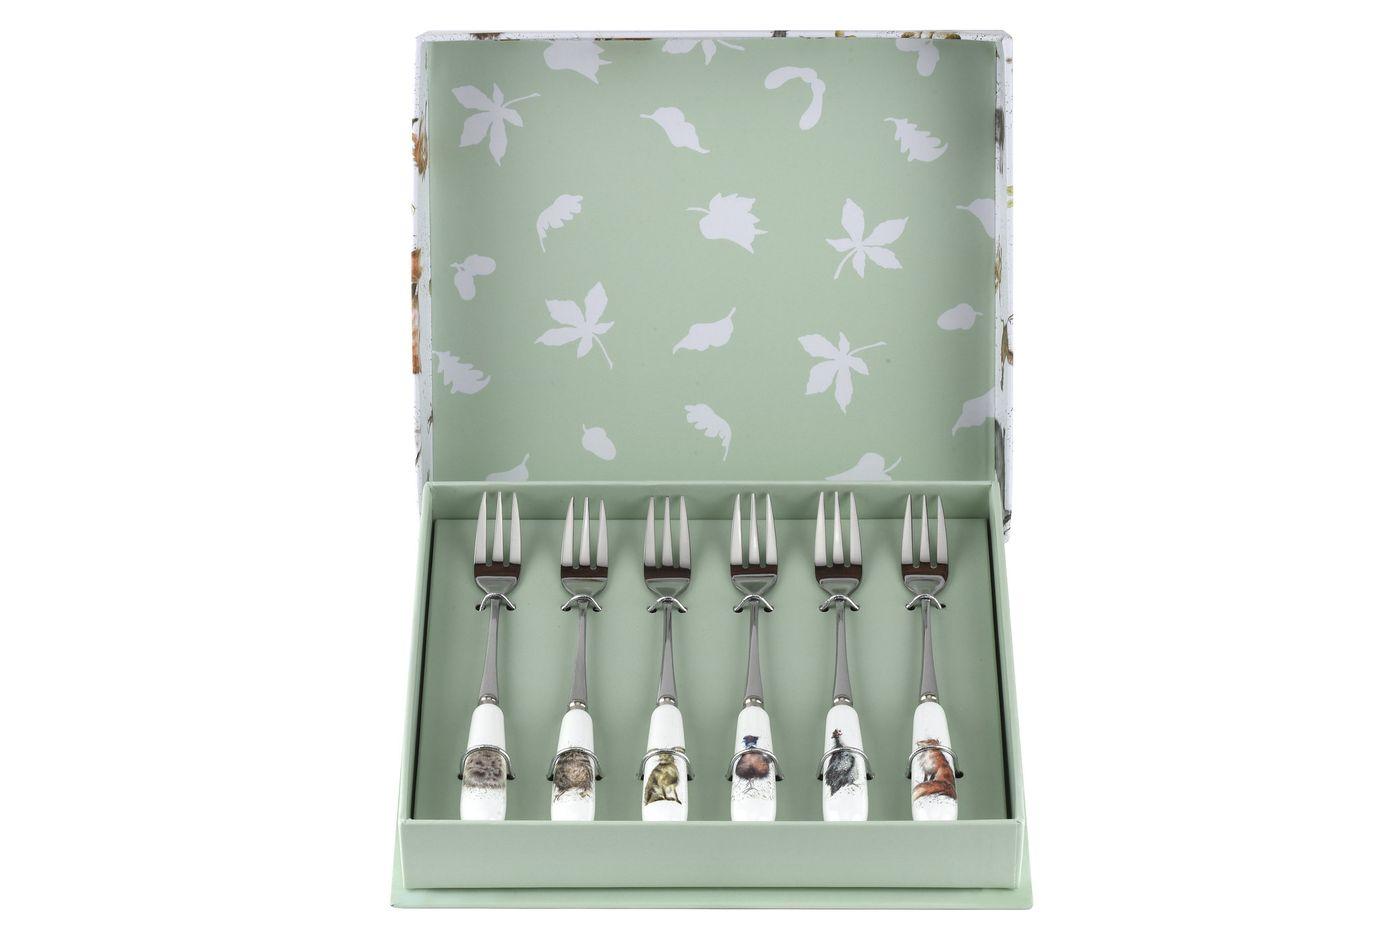 Royal Worcester Wrendale Designs Pastry Fork Set Set of 6 thumb 2